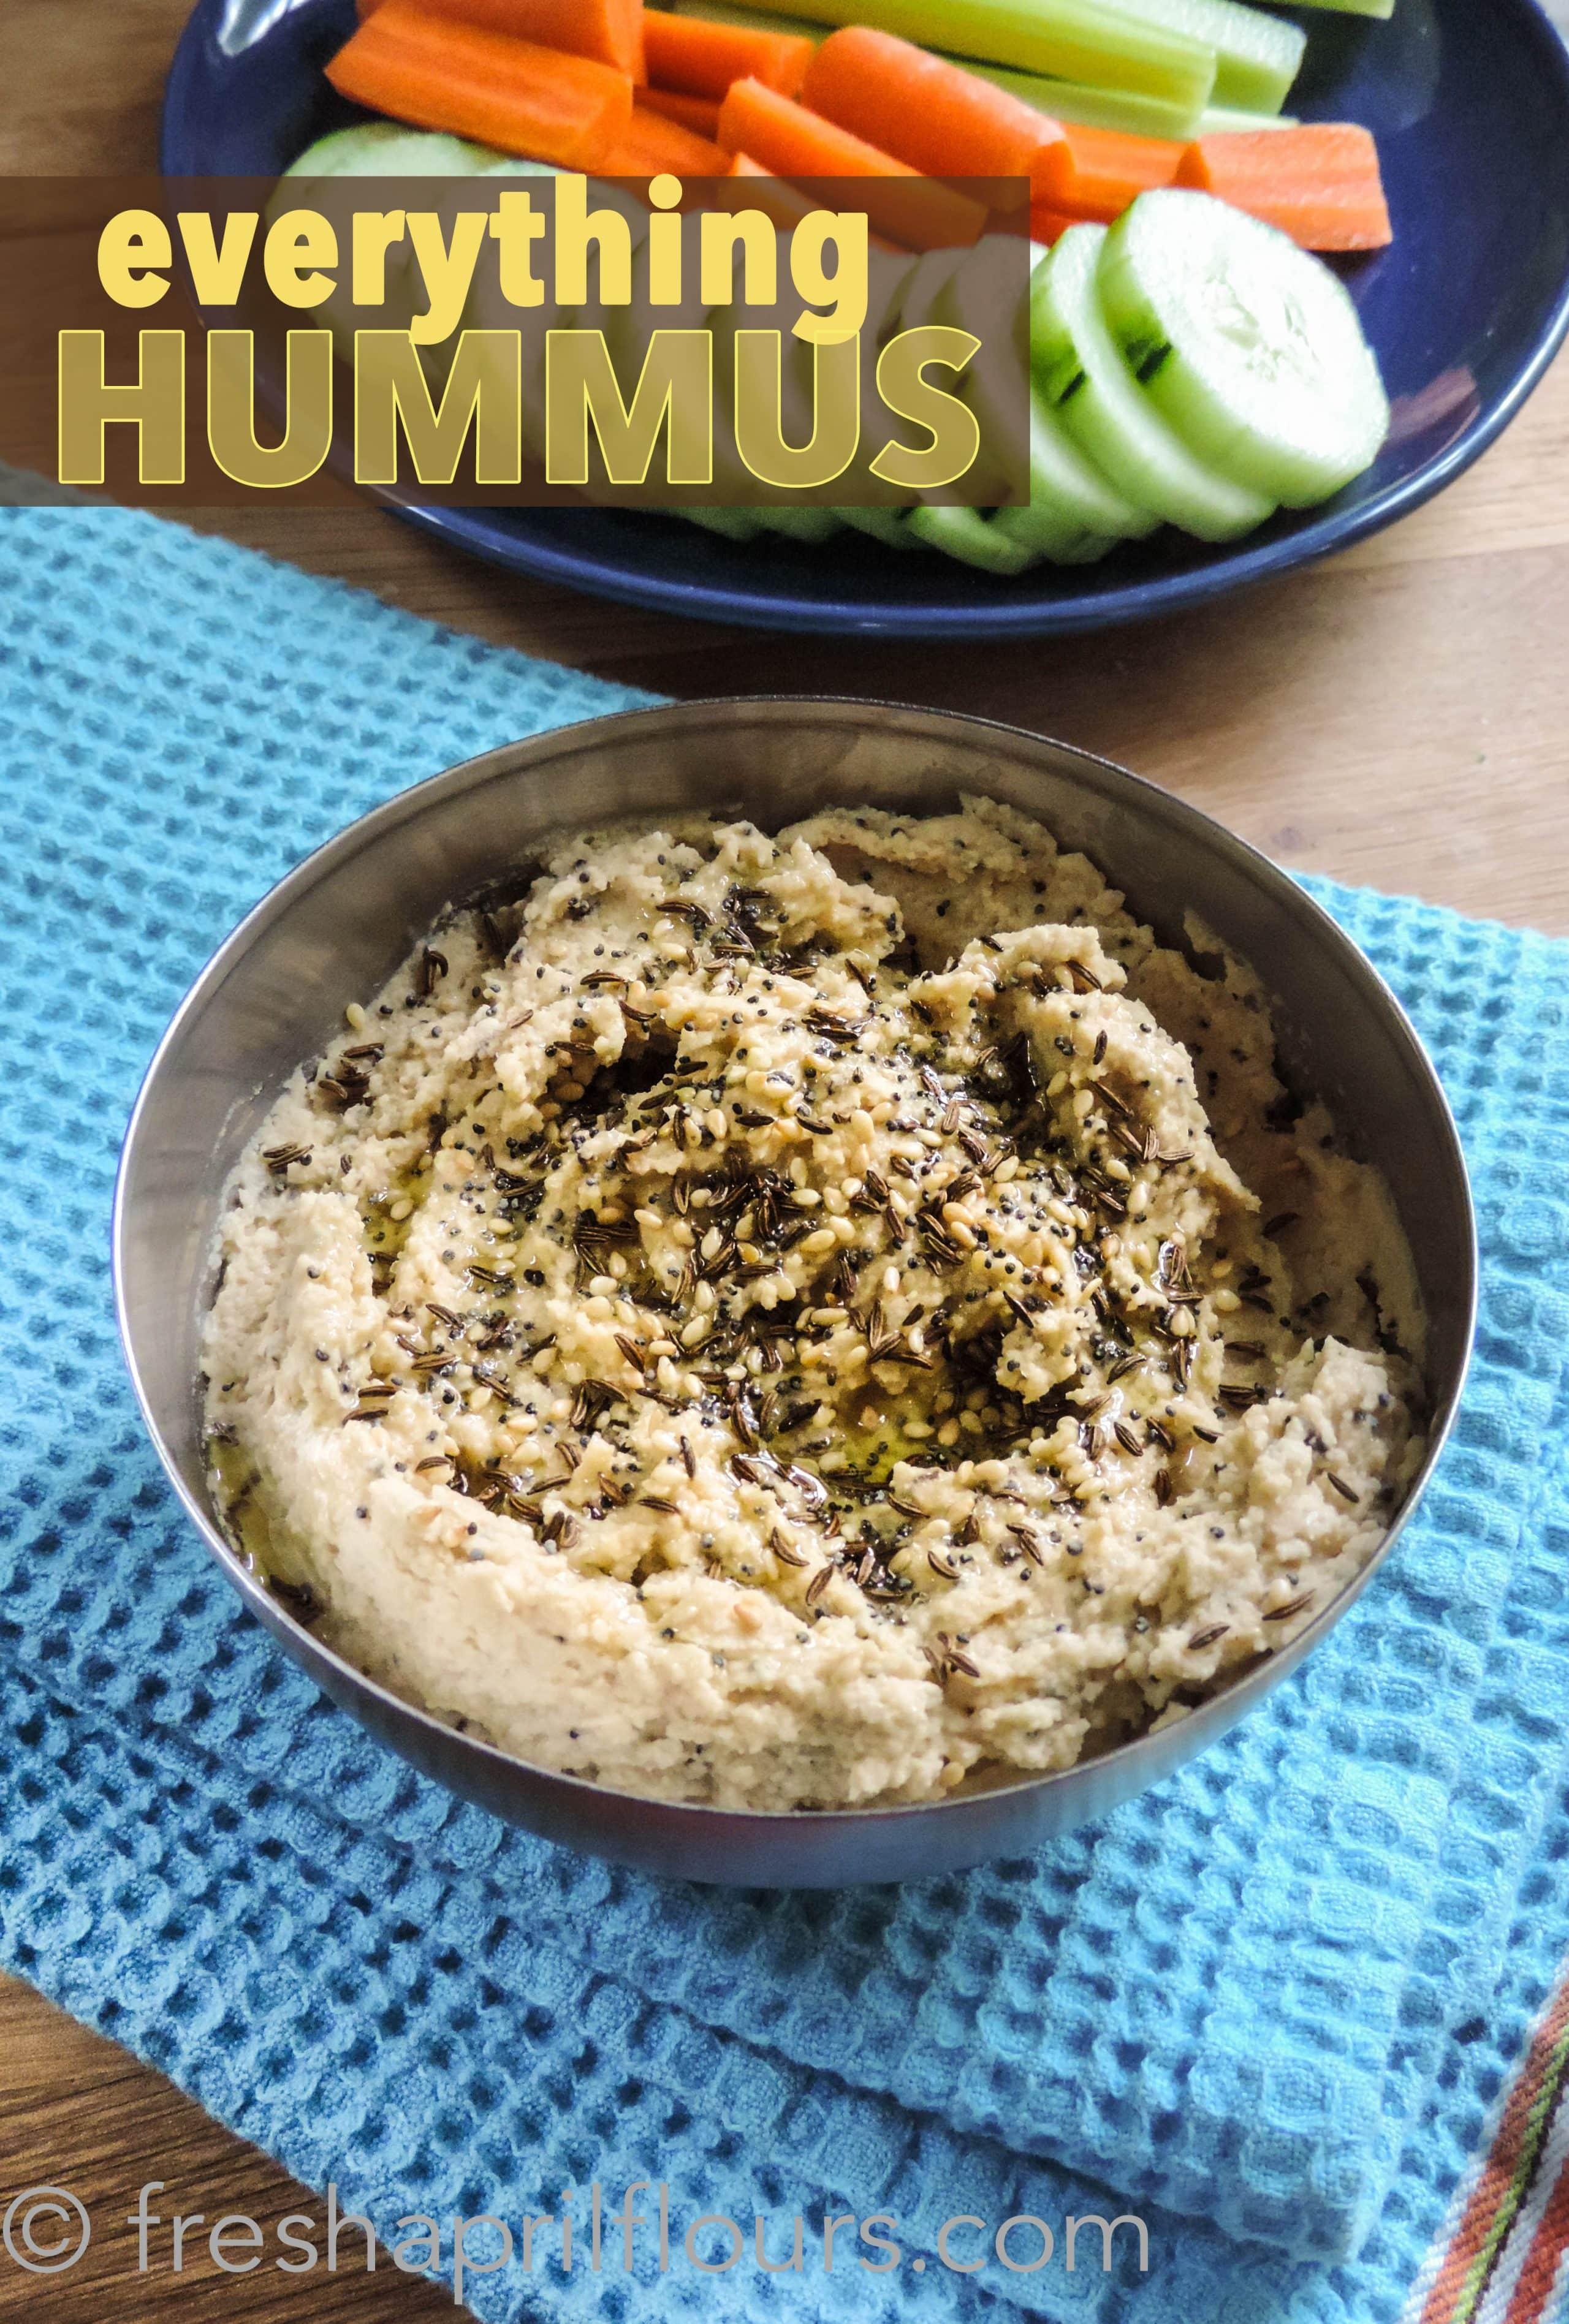 Everything Hummus: Thick and creamy homemade hummus seasoned like an everything bagel.